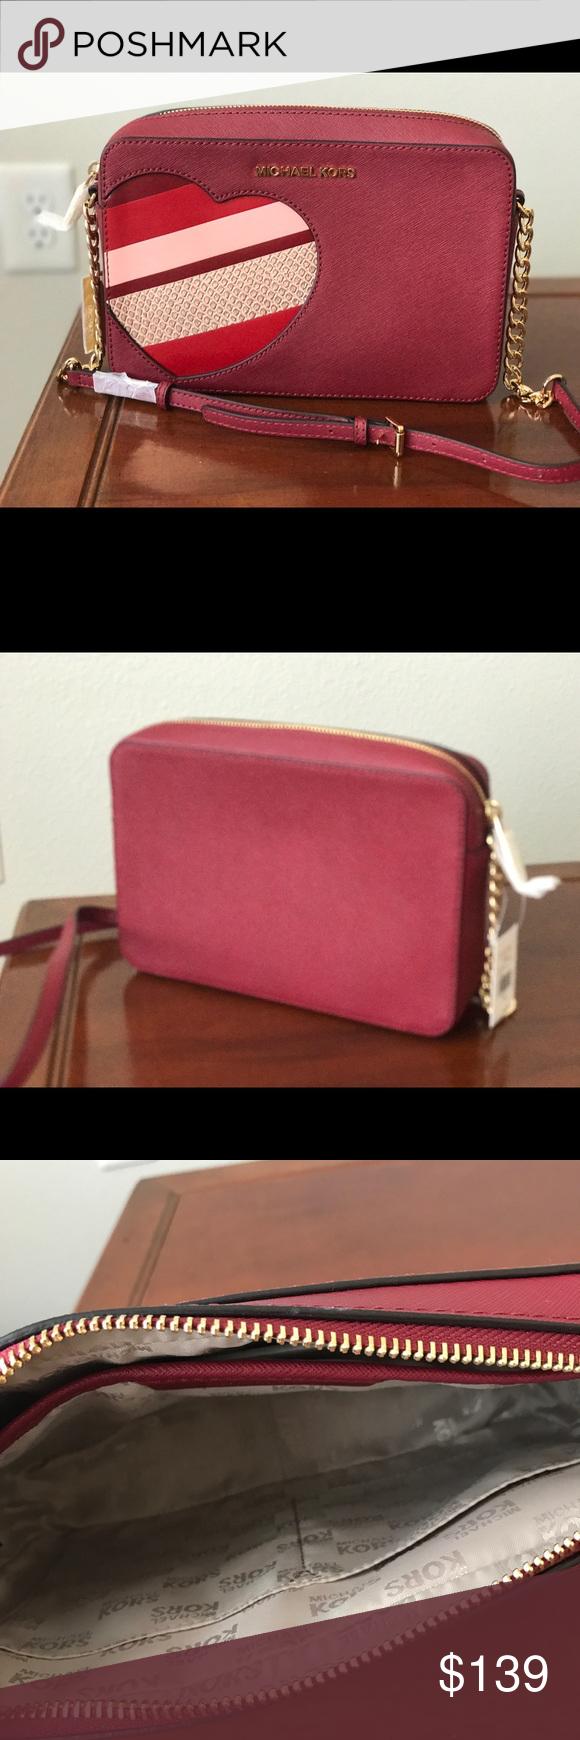 MK red heart Bag NWT   Poshmark   Pinterest   Bags, Mk bags and ... b8462f82e9